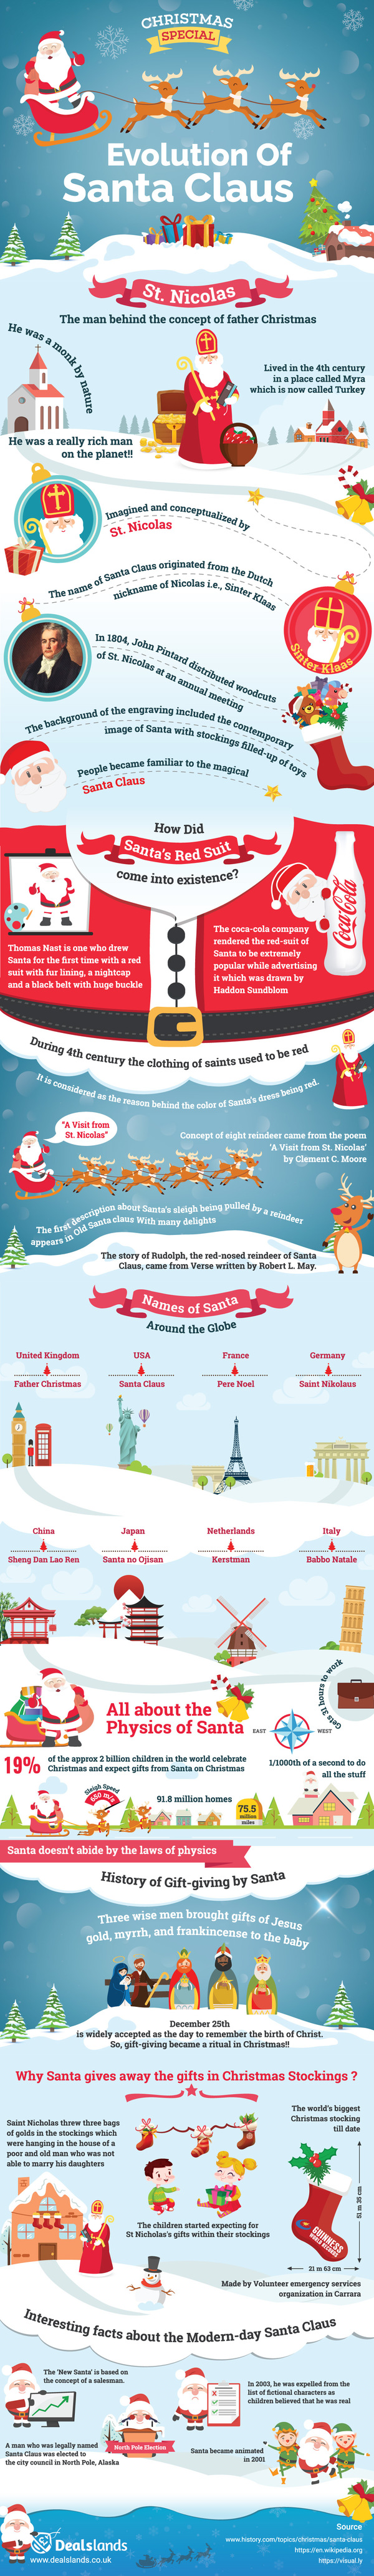 The Evolution Of Santa Claus